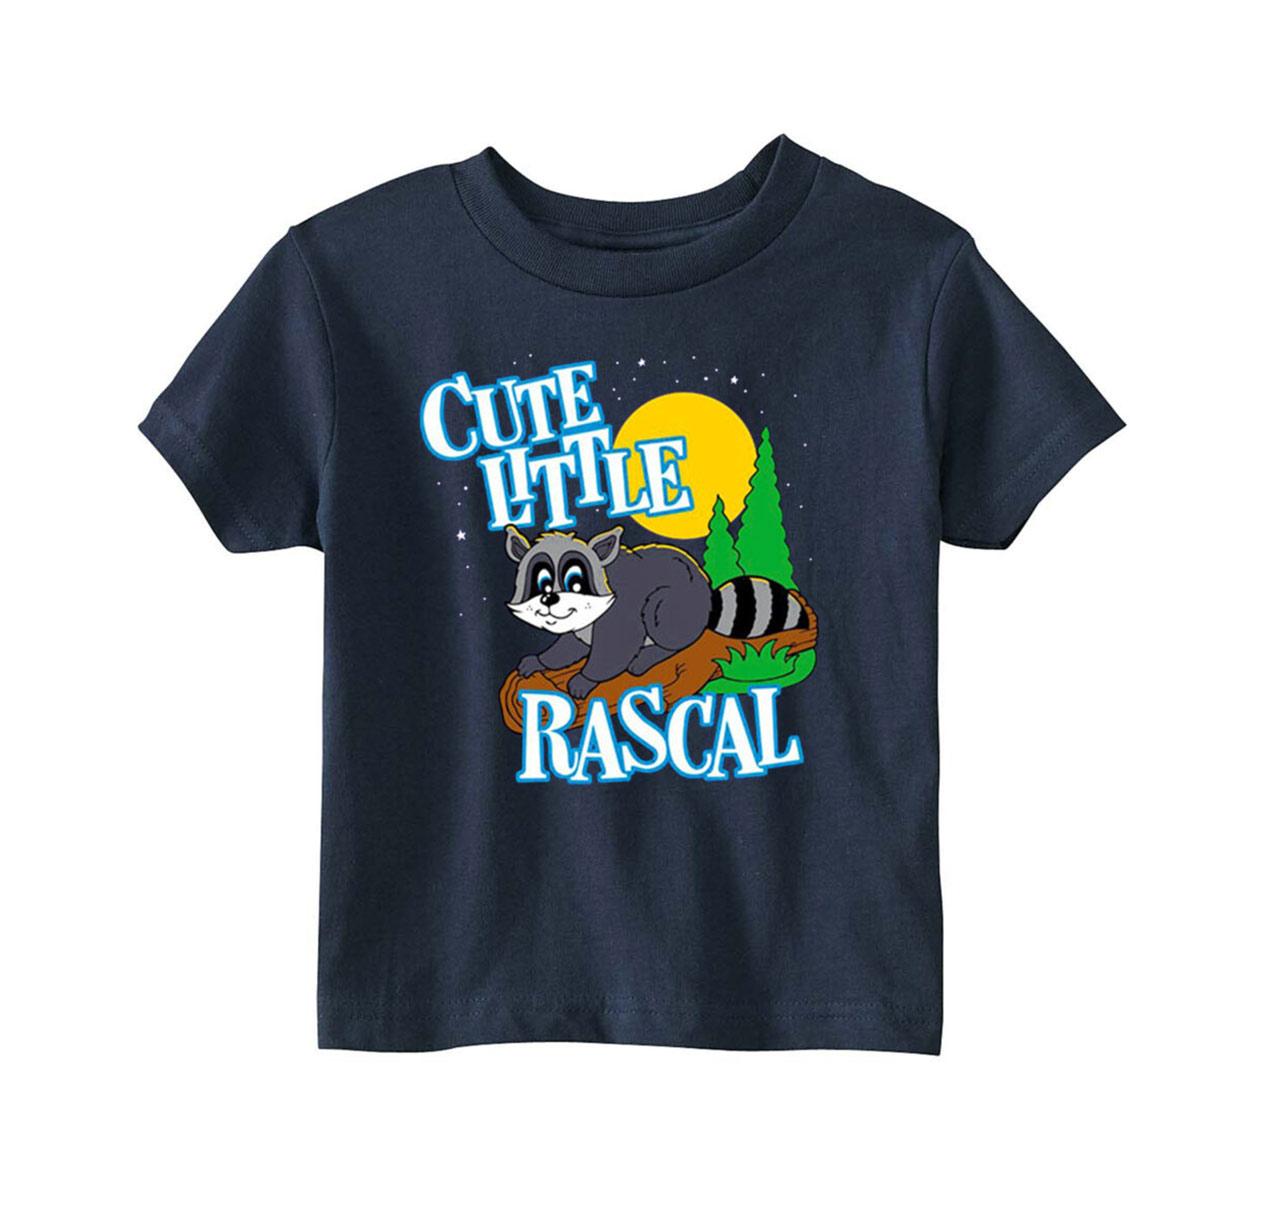 Cute-Little-Rascal-PCUTELILRA-RS3301-Navy_2